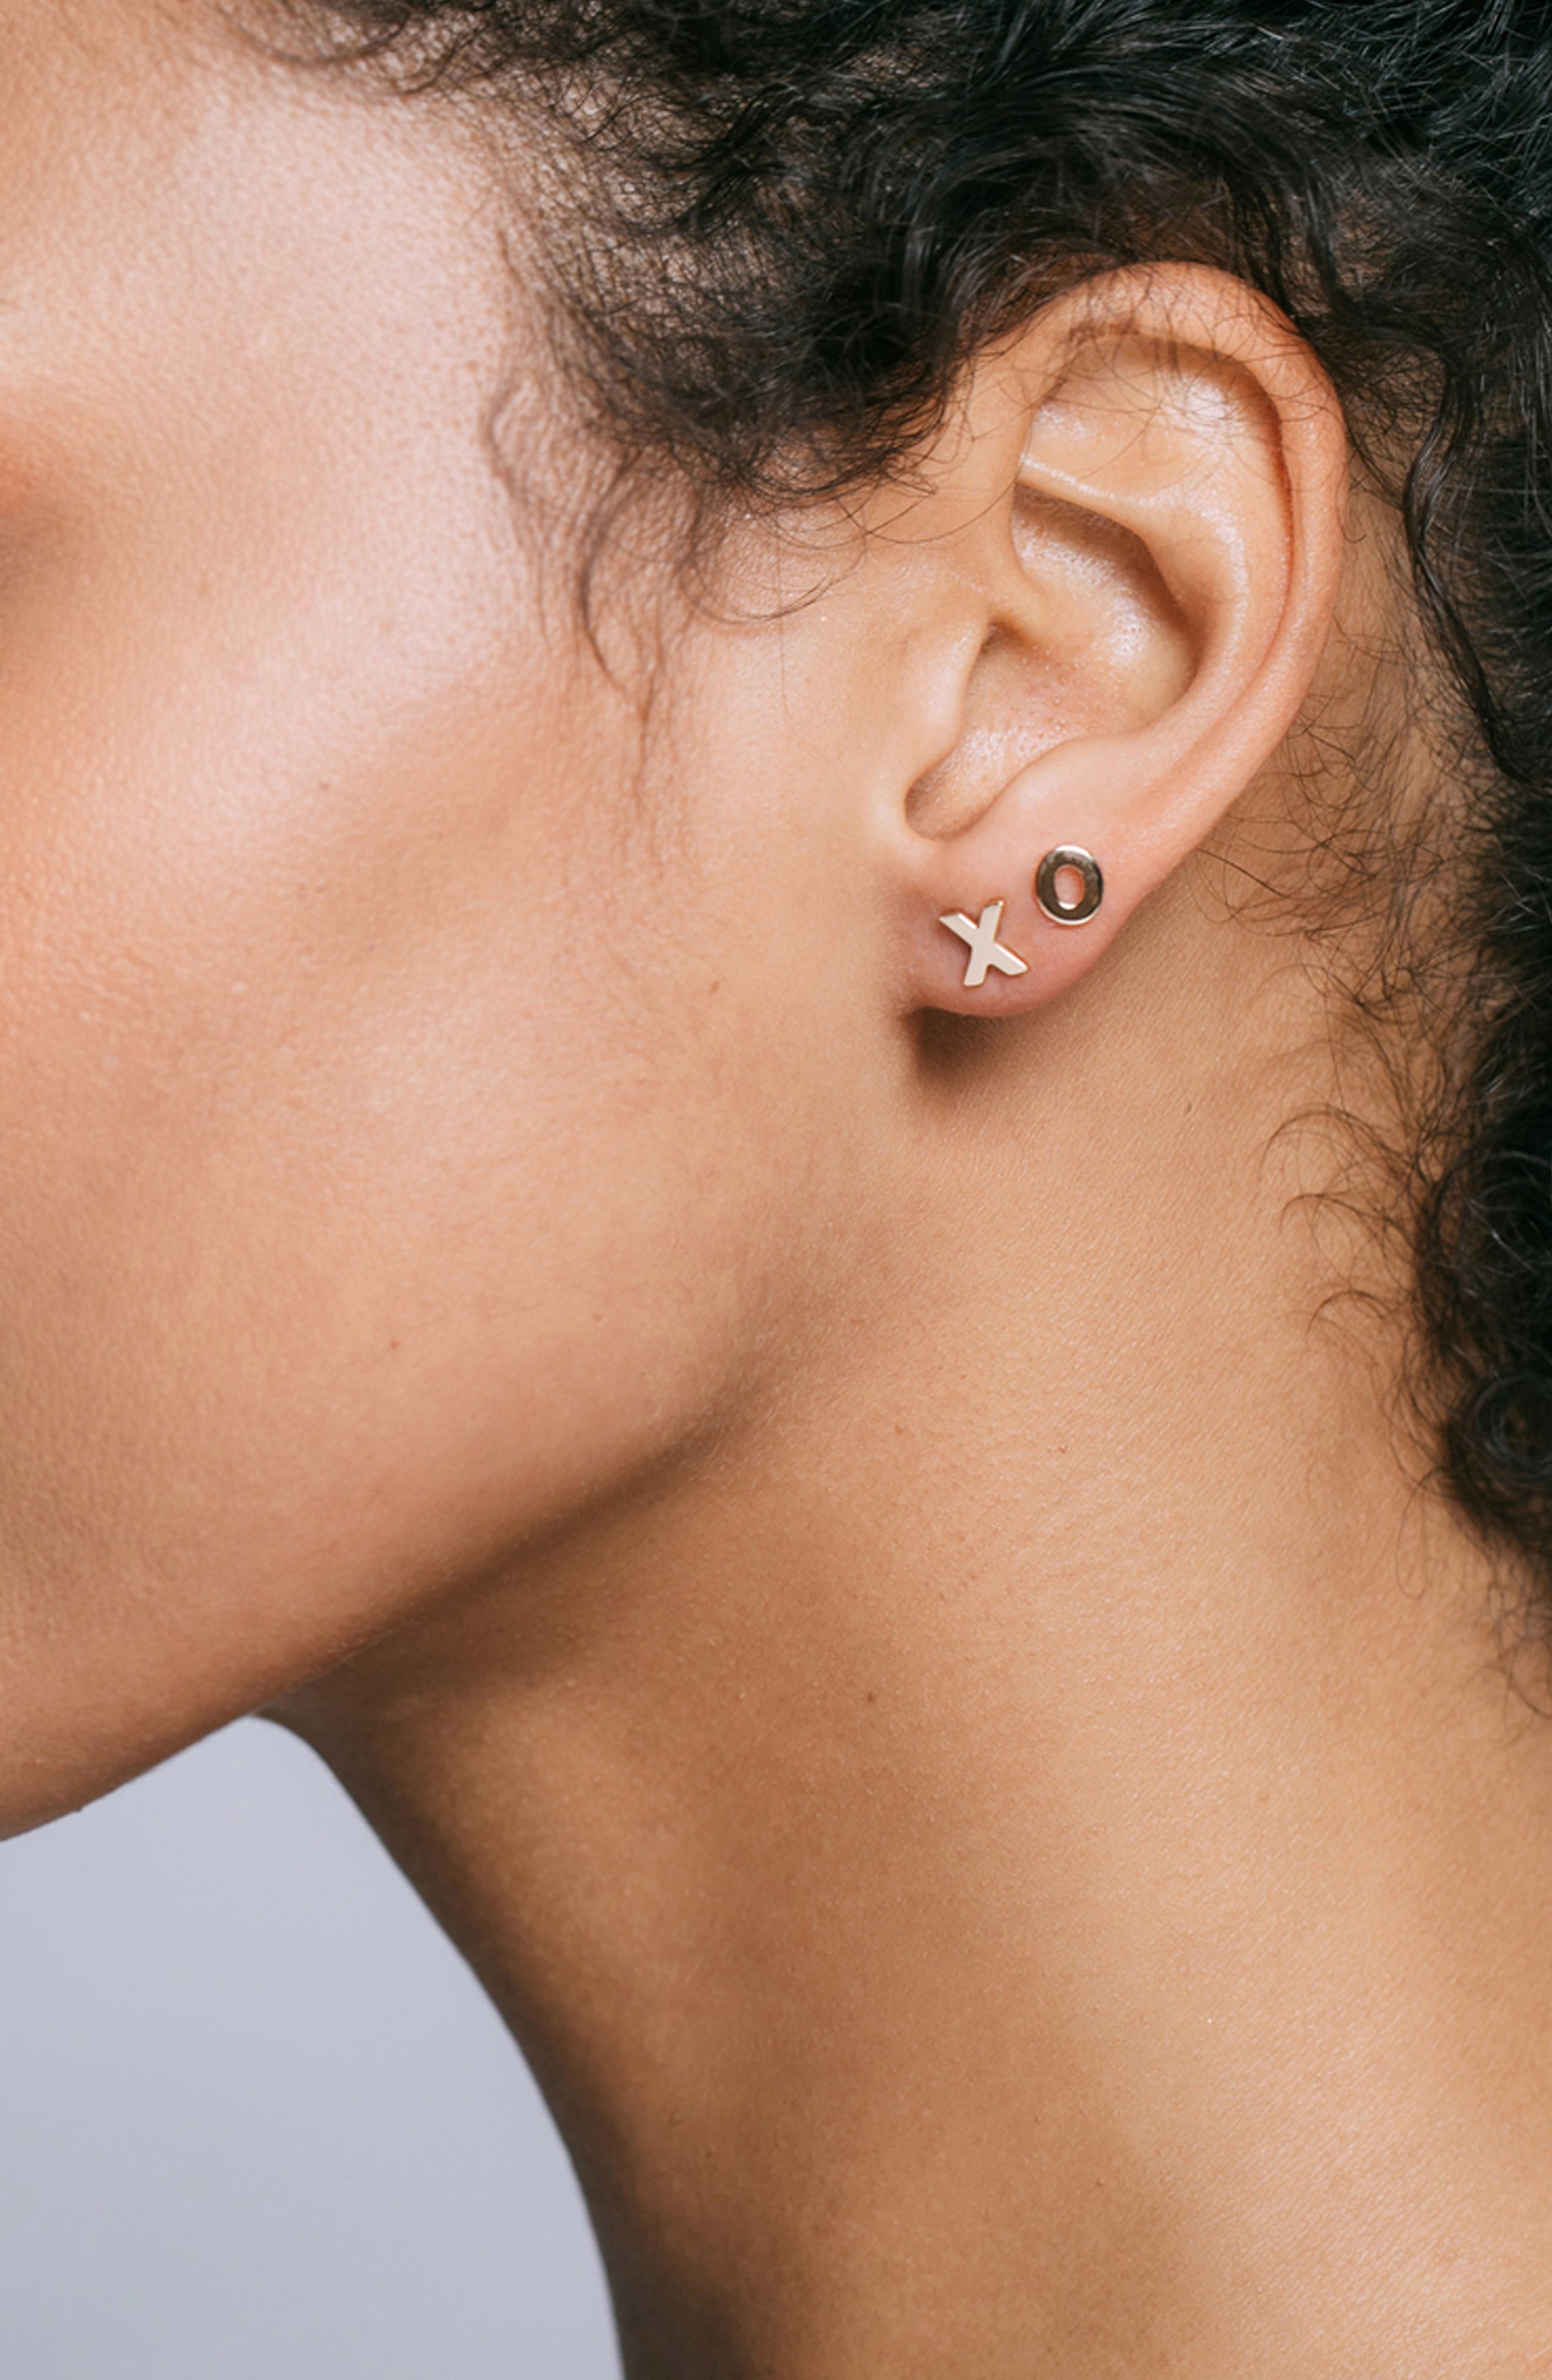 XO Stud Earrings,                             Alternate thumbnail 3, color,                             GOLD